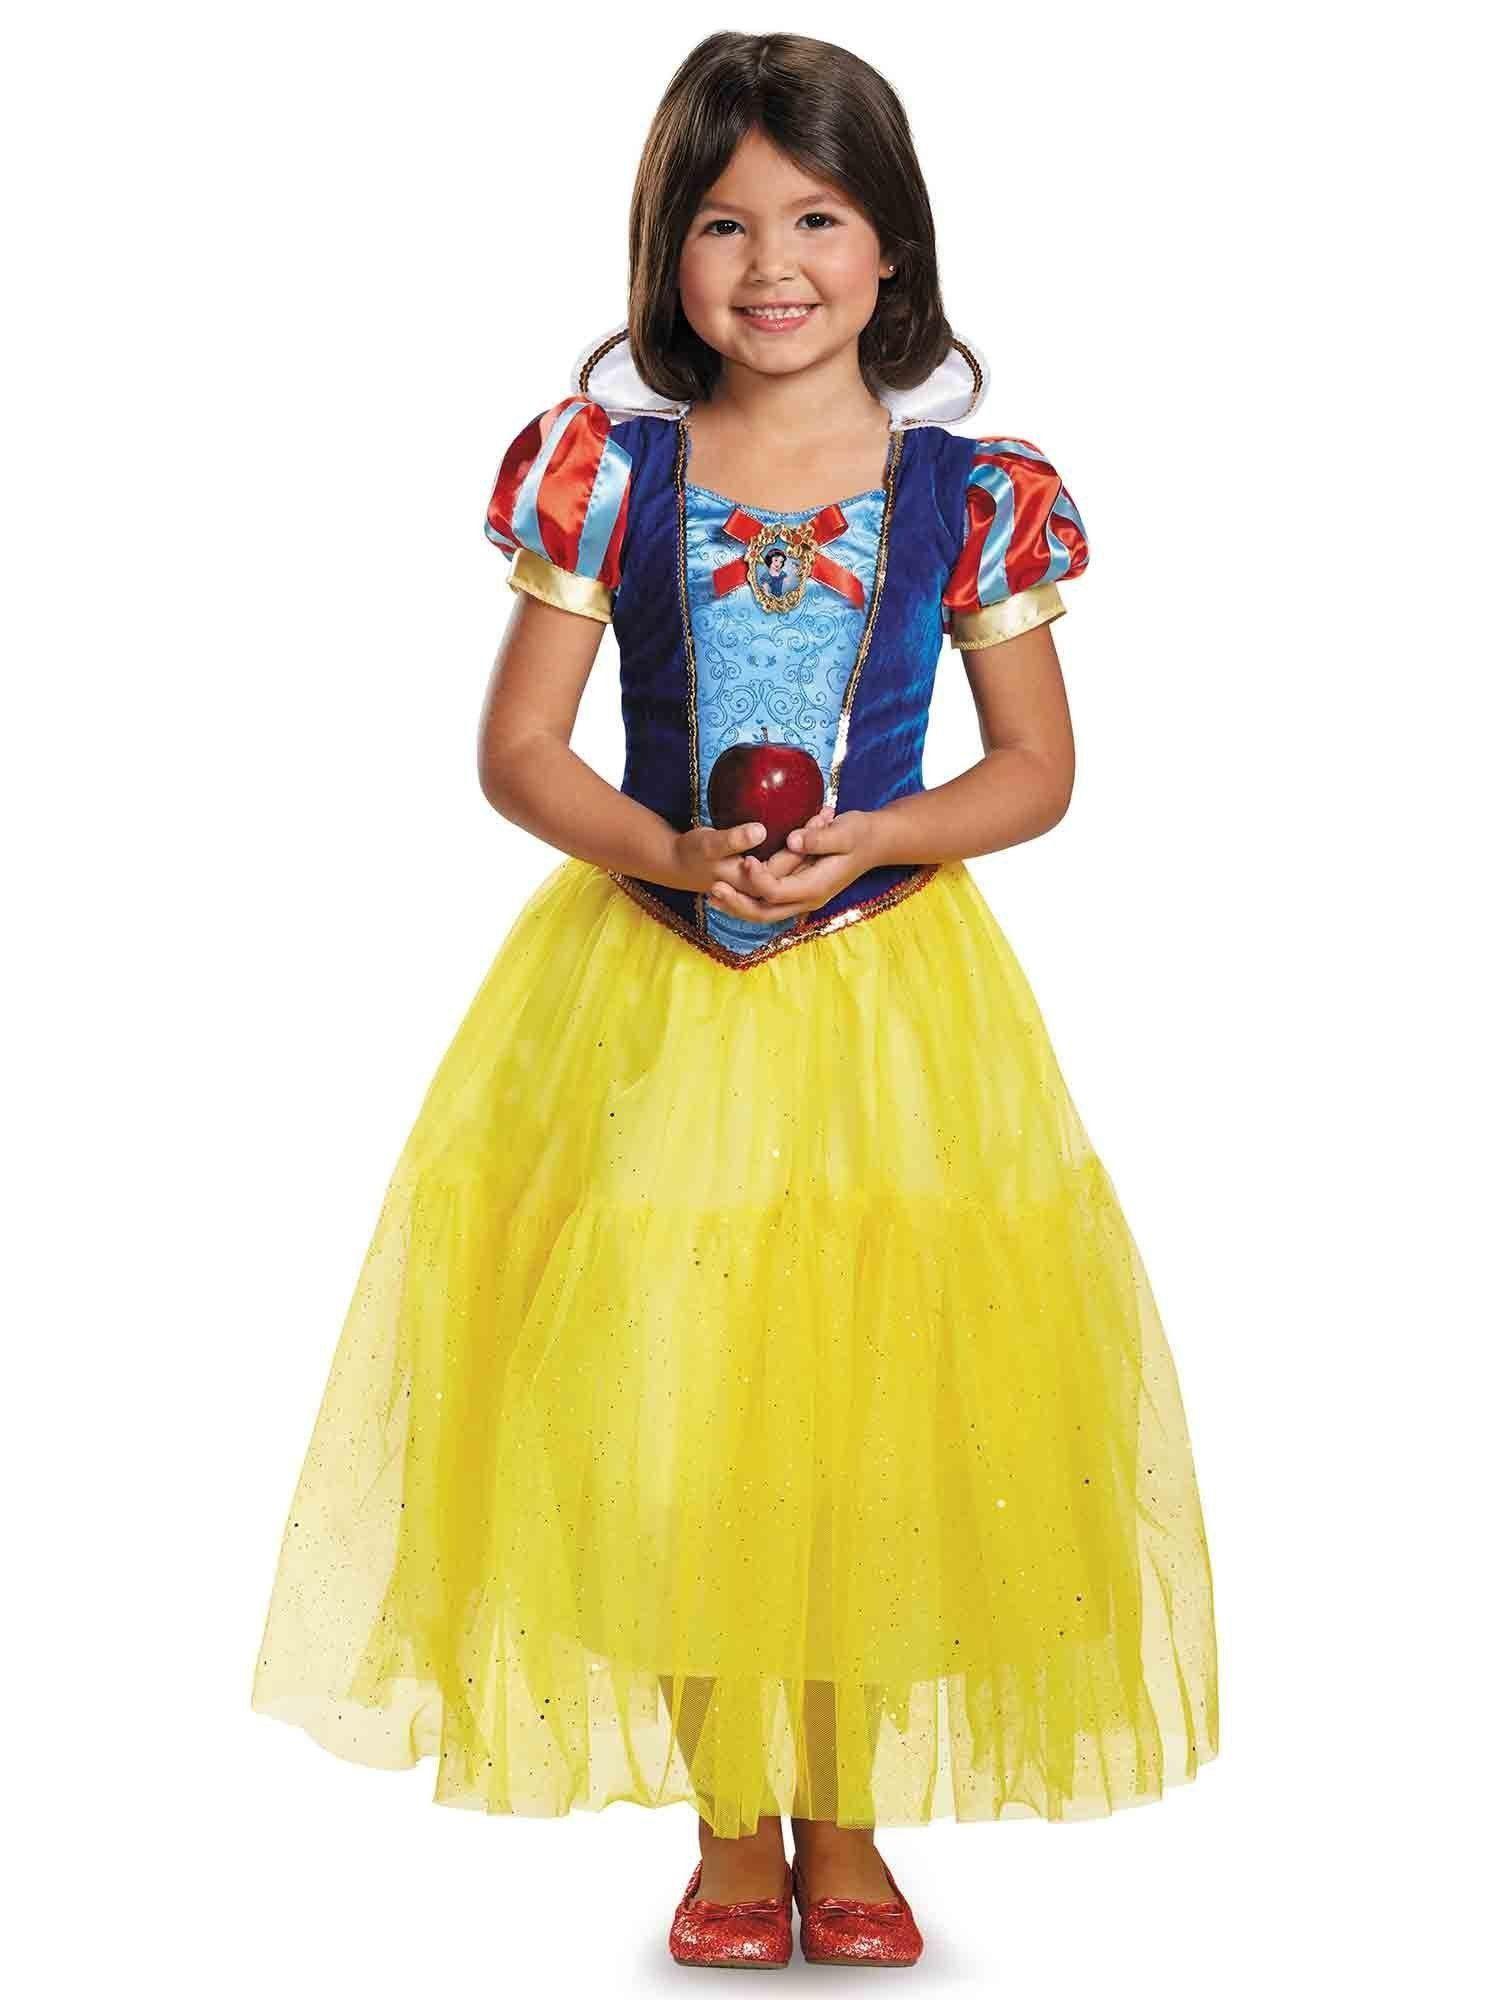 Fantasia Infantil Feminino Branca de Neve: Disney (Deluxe) (Apenas Venda Online)